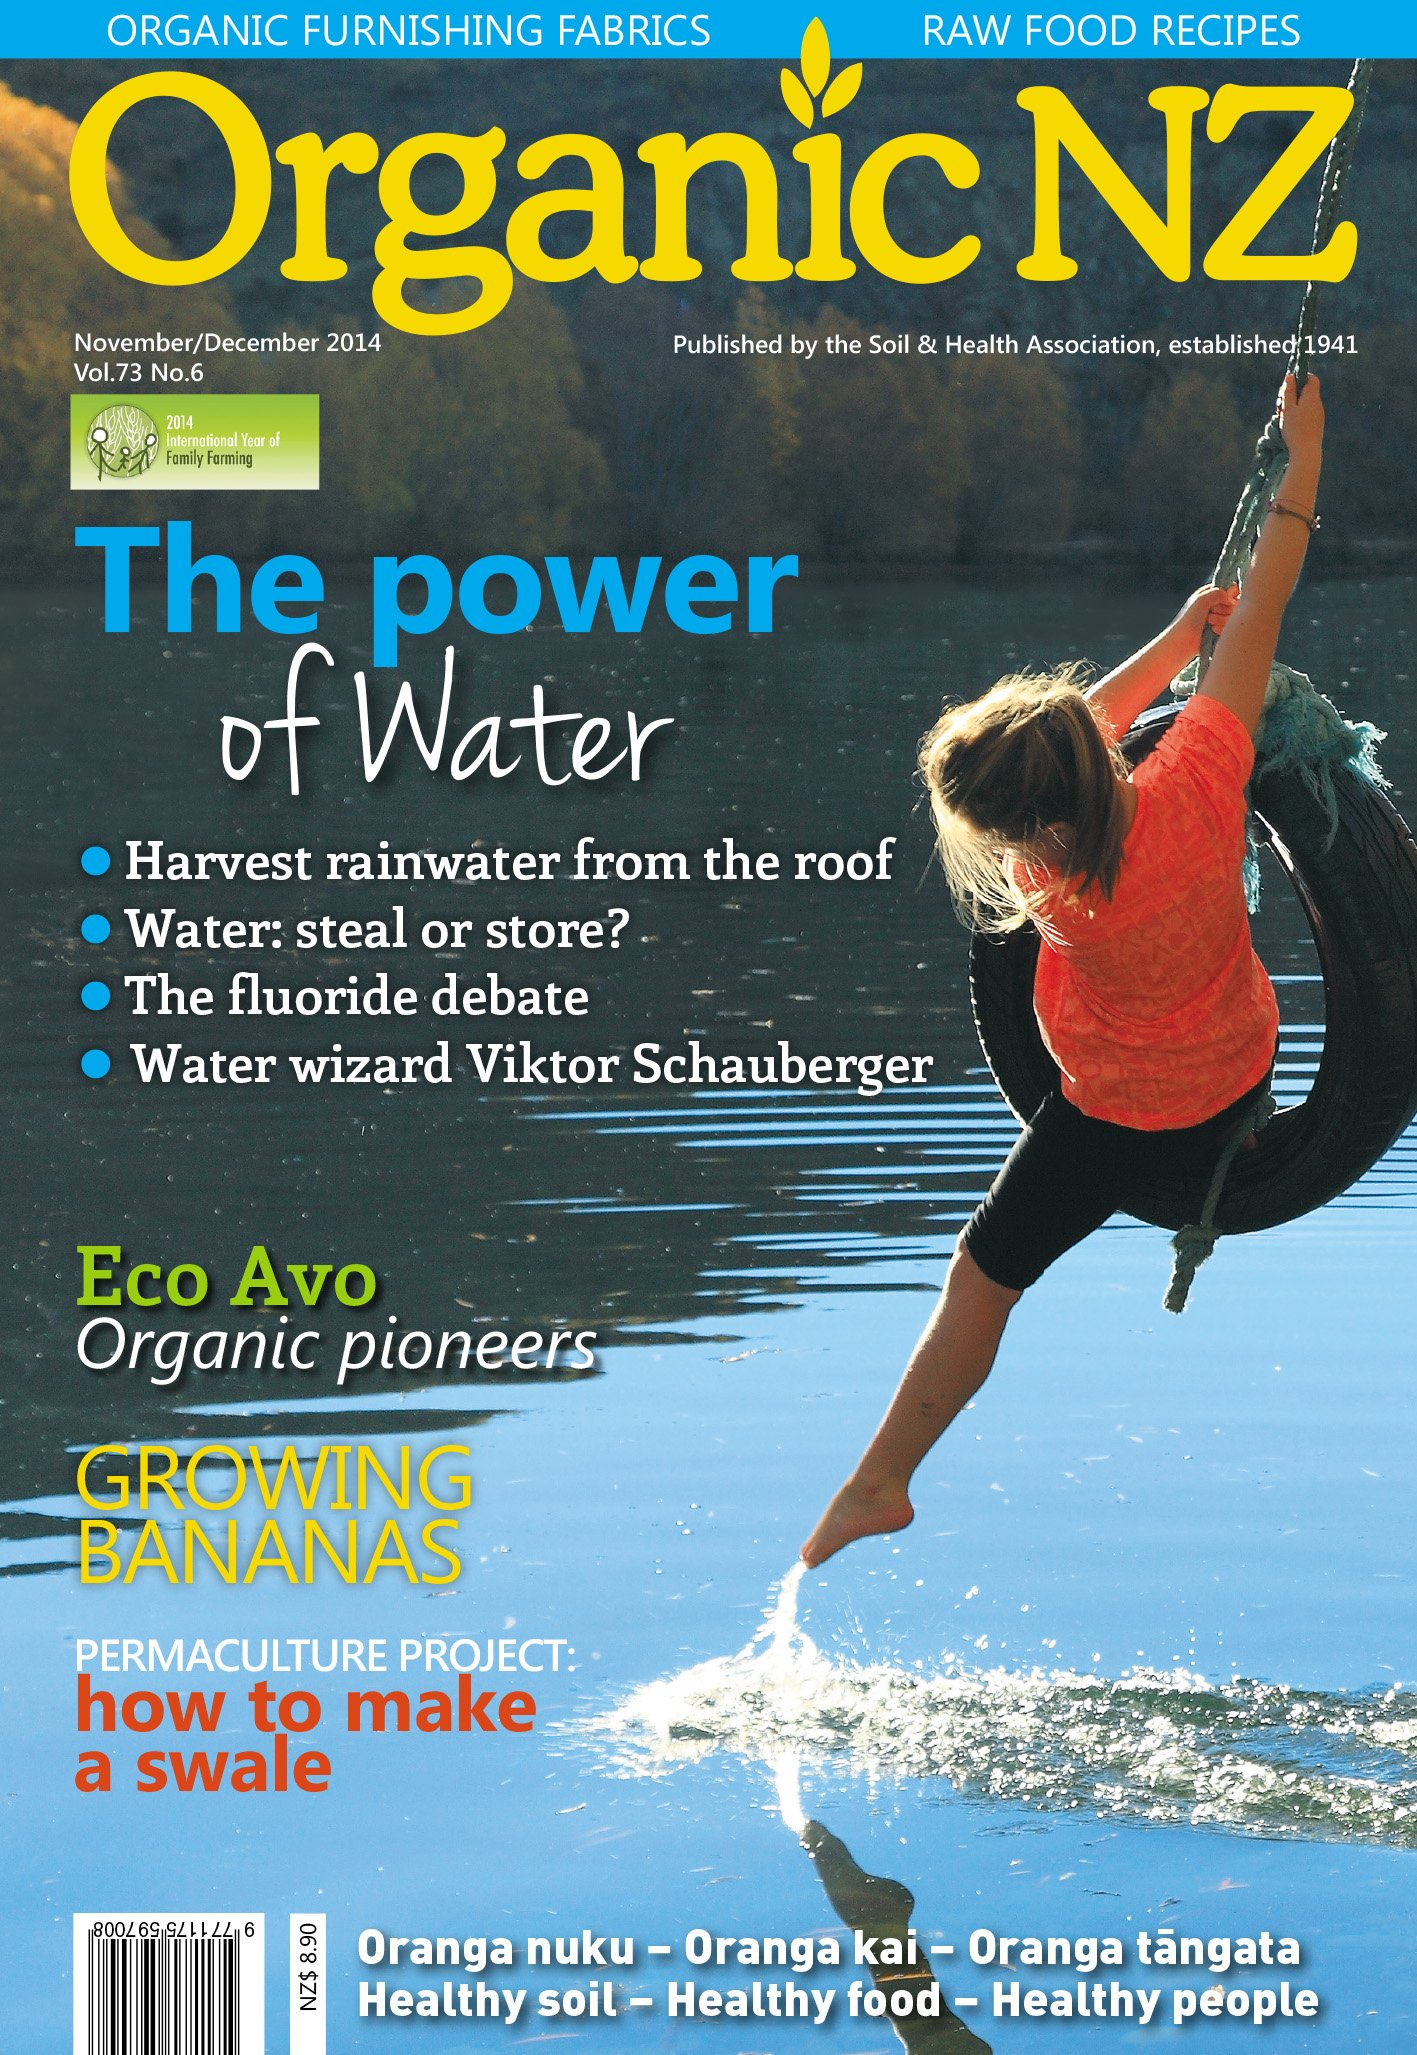 Organic NZ November/December 2014 cover